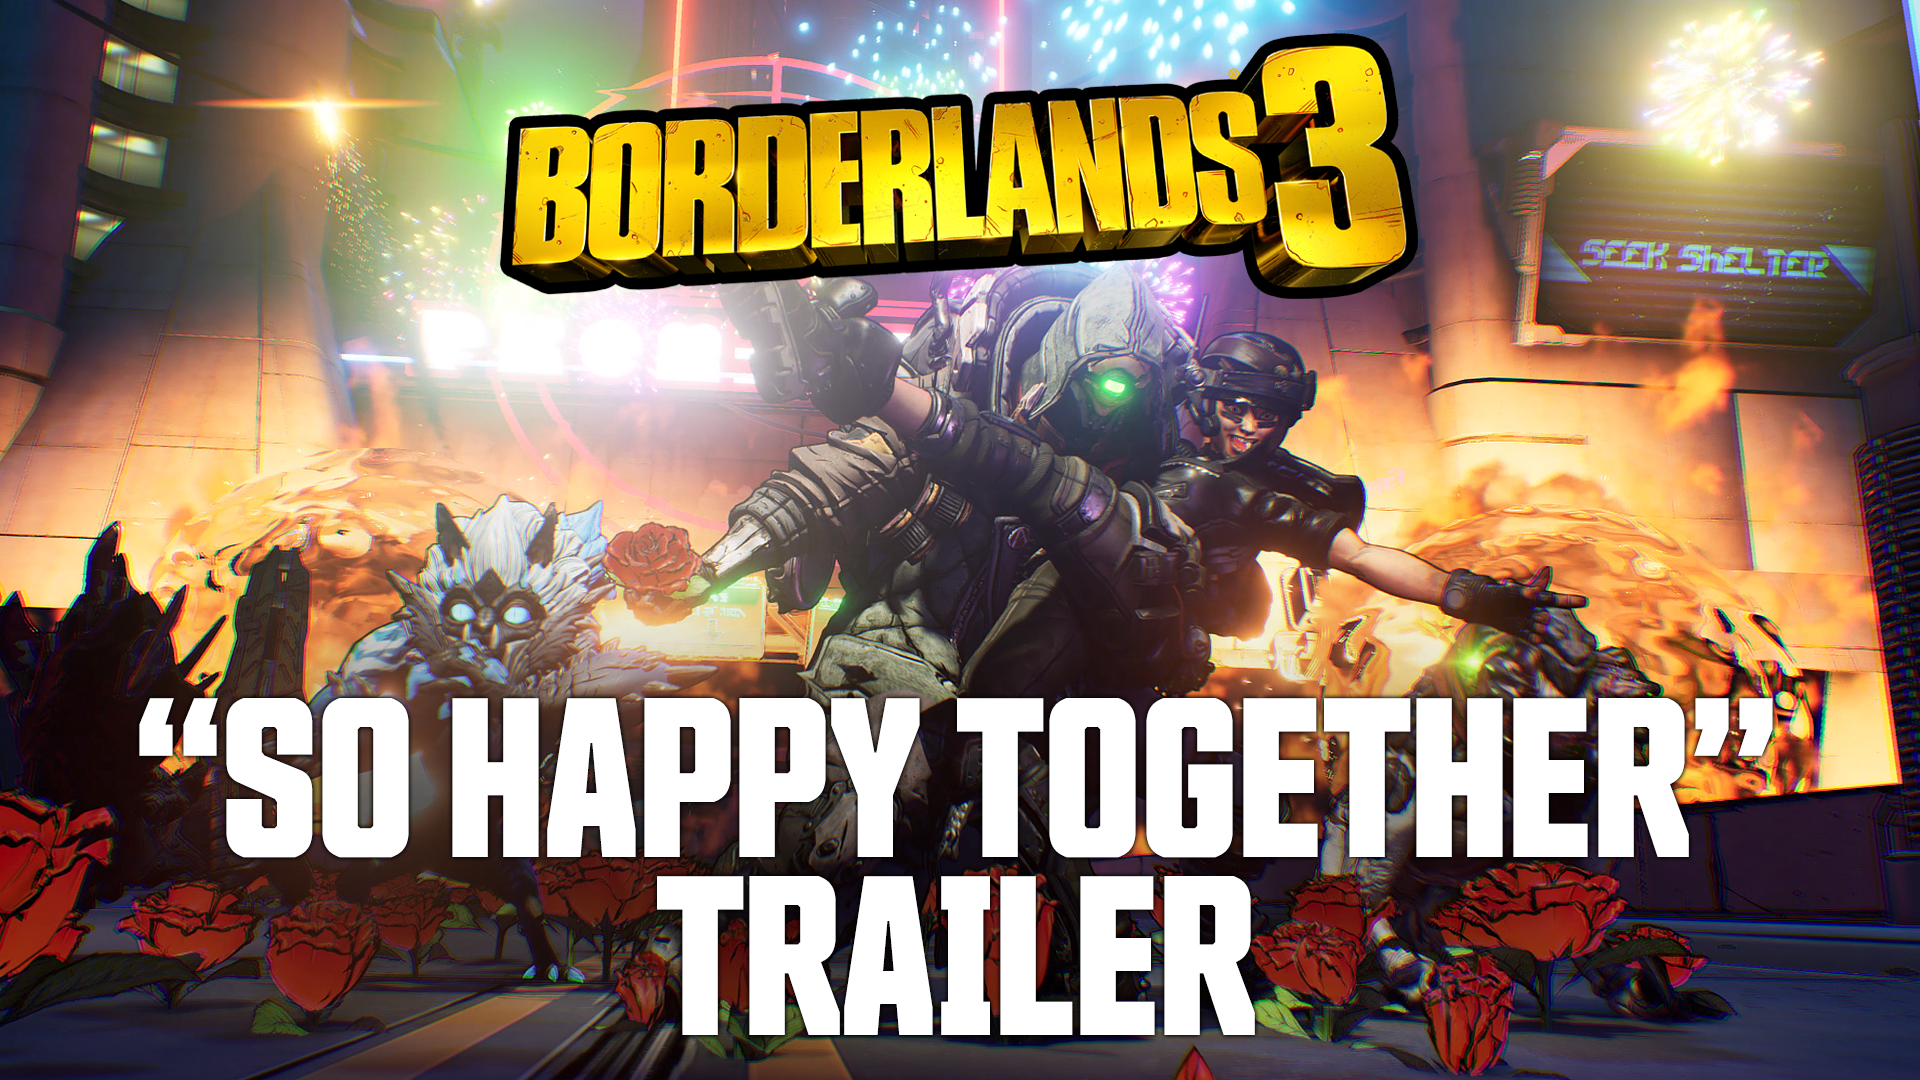 Borderlands 3 for Xbox One | Xbox